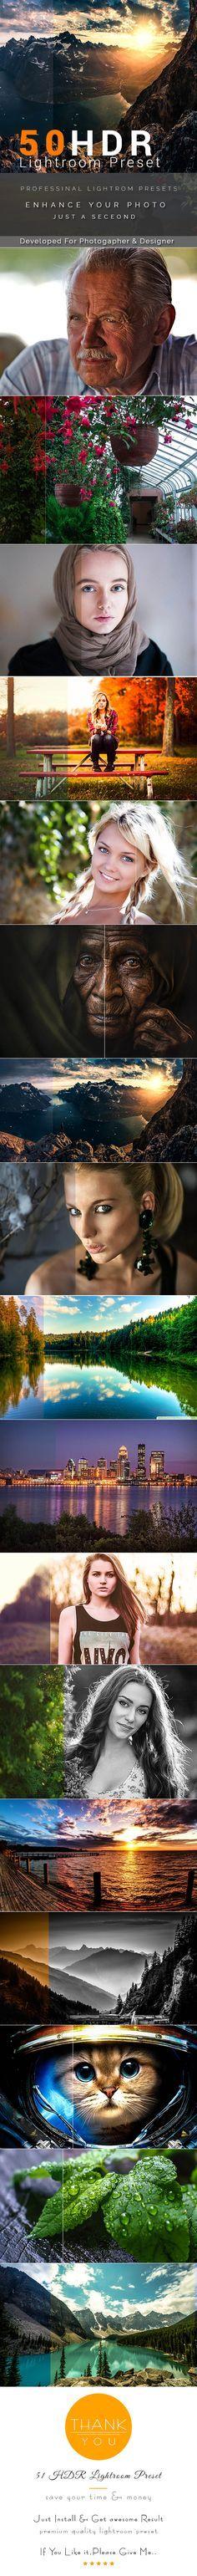 50 HDR Lightroom Preset — LRTemplate #premium effect #retouching presets • Download ➝ https://graphicriver.net/item/50-hdr-lightroom-preset/19698561?ref=pxcr